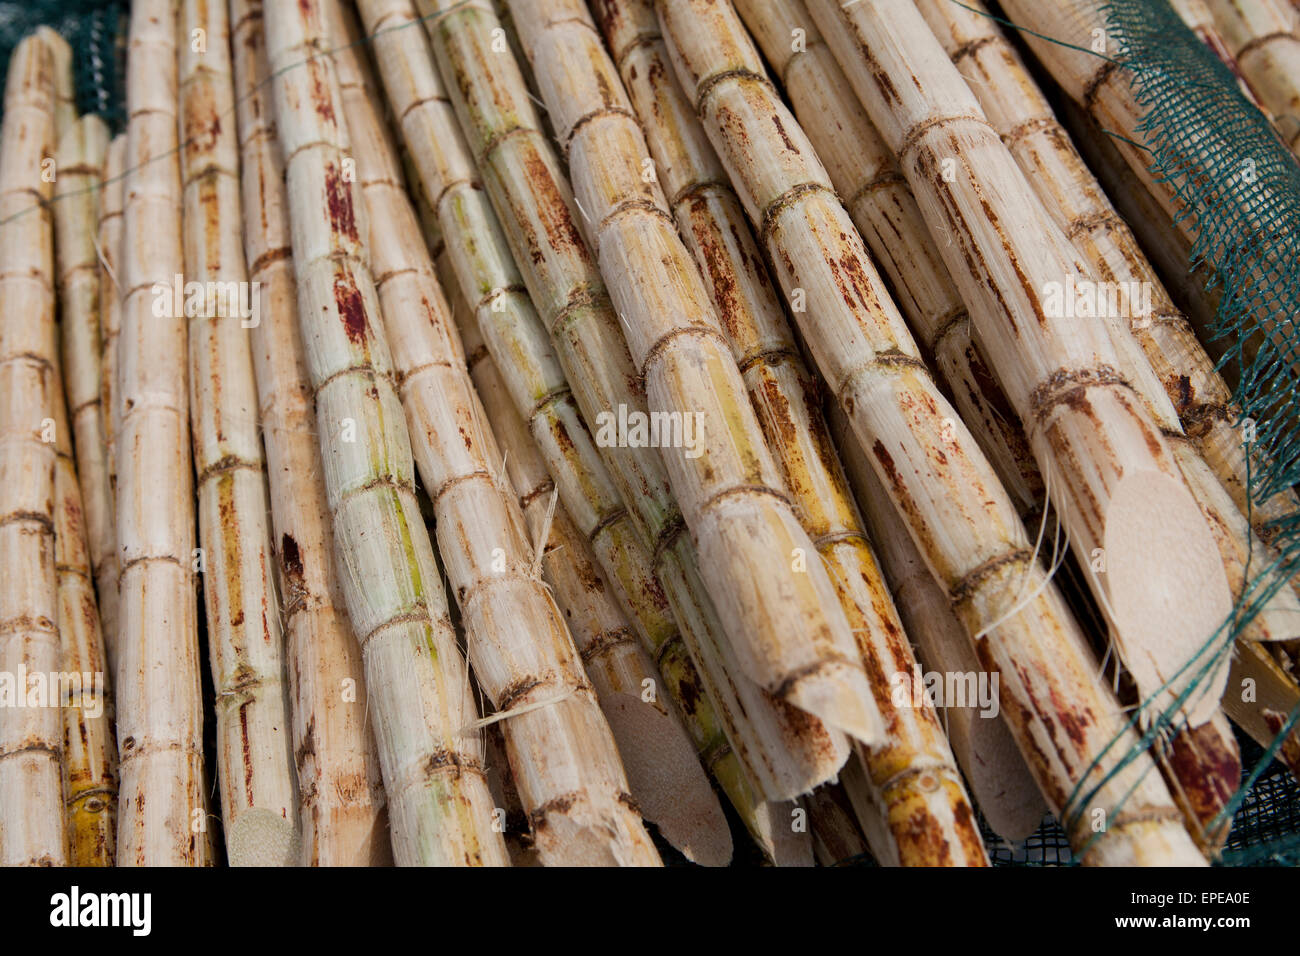 Cut sugarcane stems - Stock Image